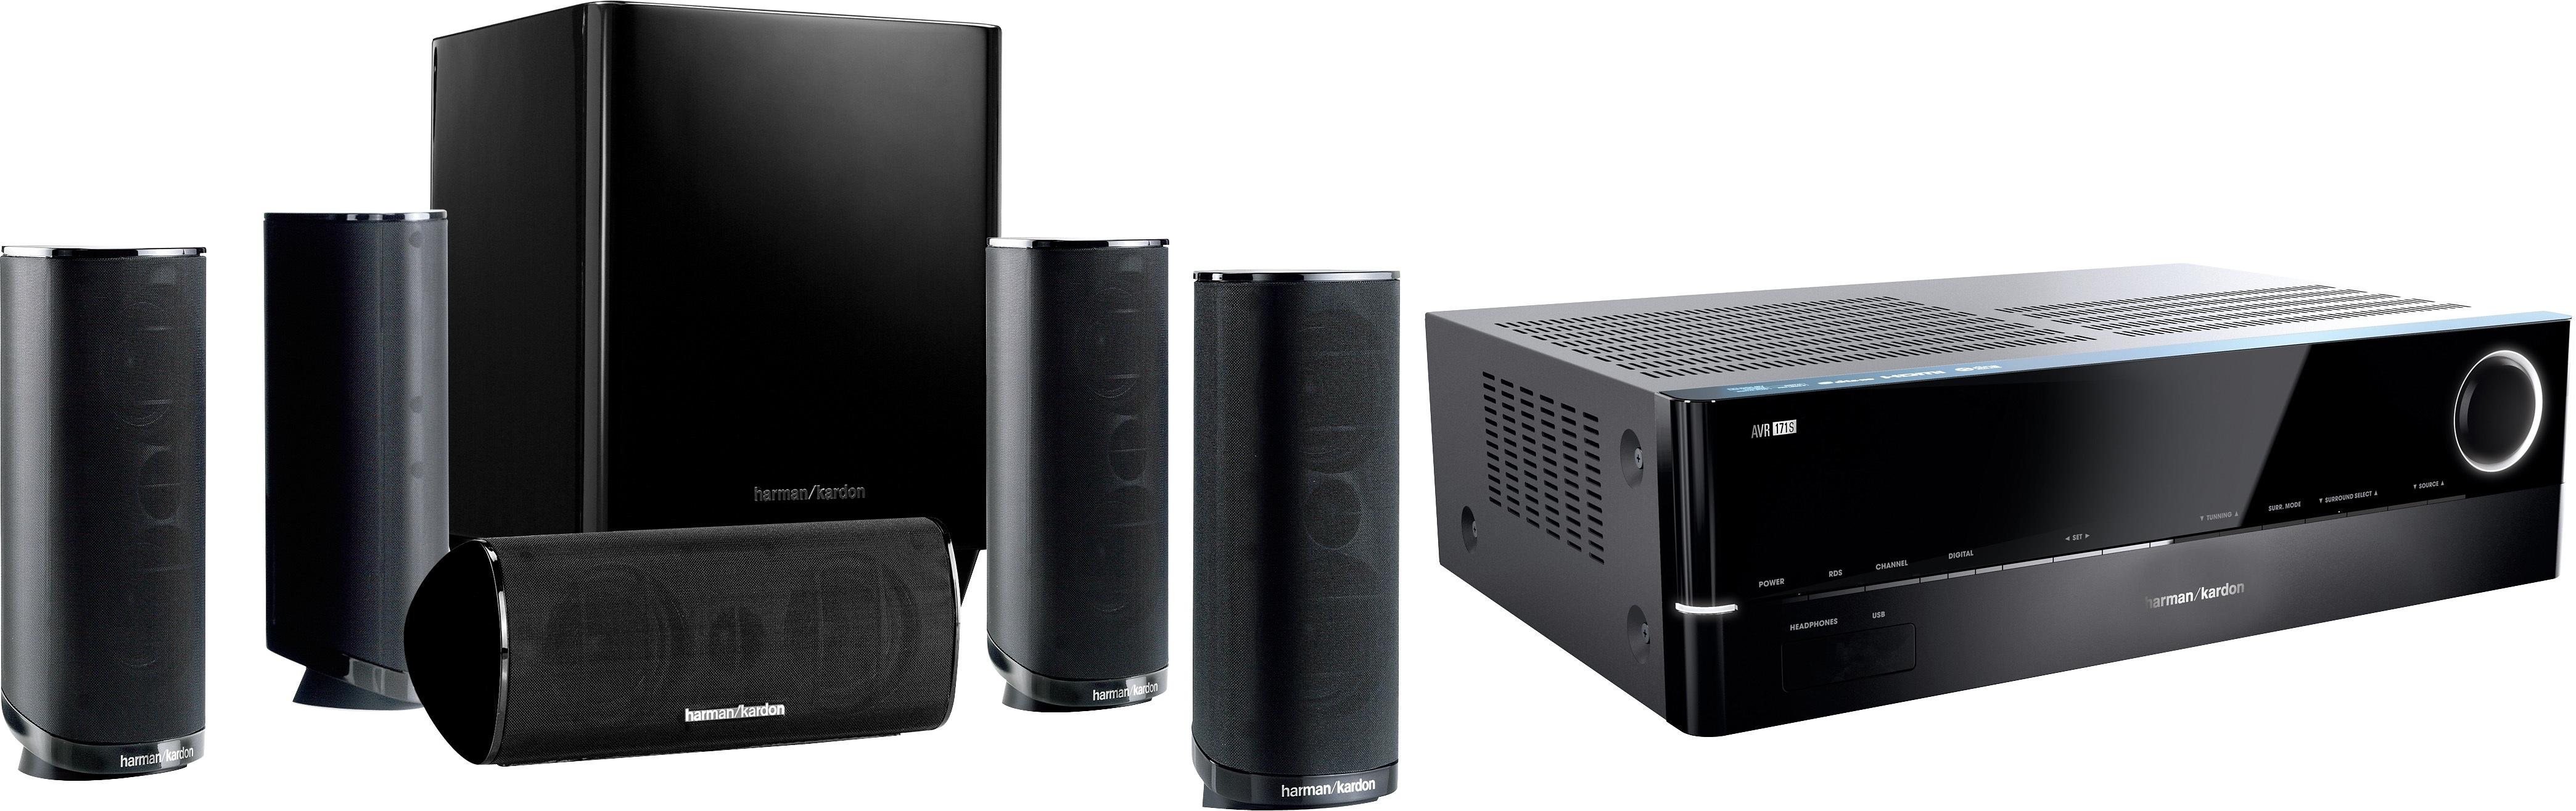 Harman/kardon HD Com 1716S thuisbioscoop, 700 W, 3D, Bluetooth, Spotify/vTuner bij OTTO online kopen